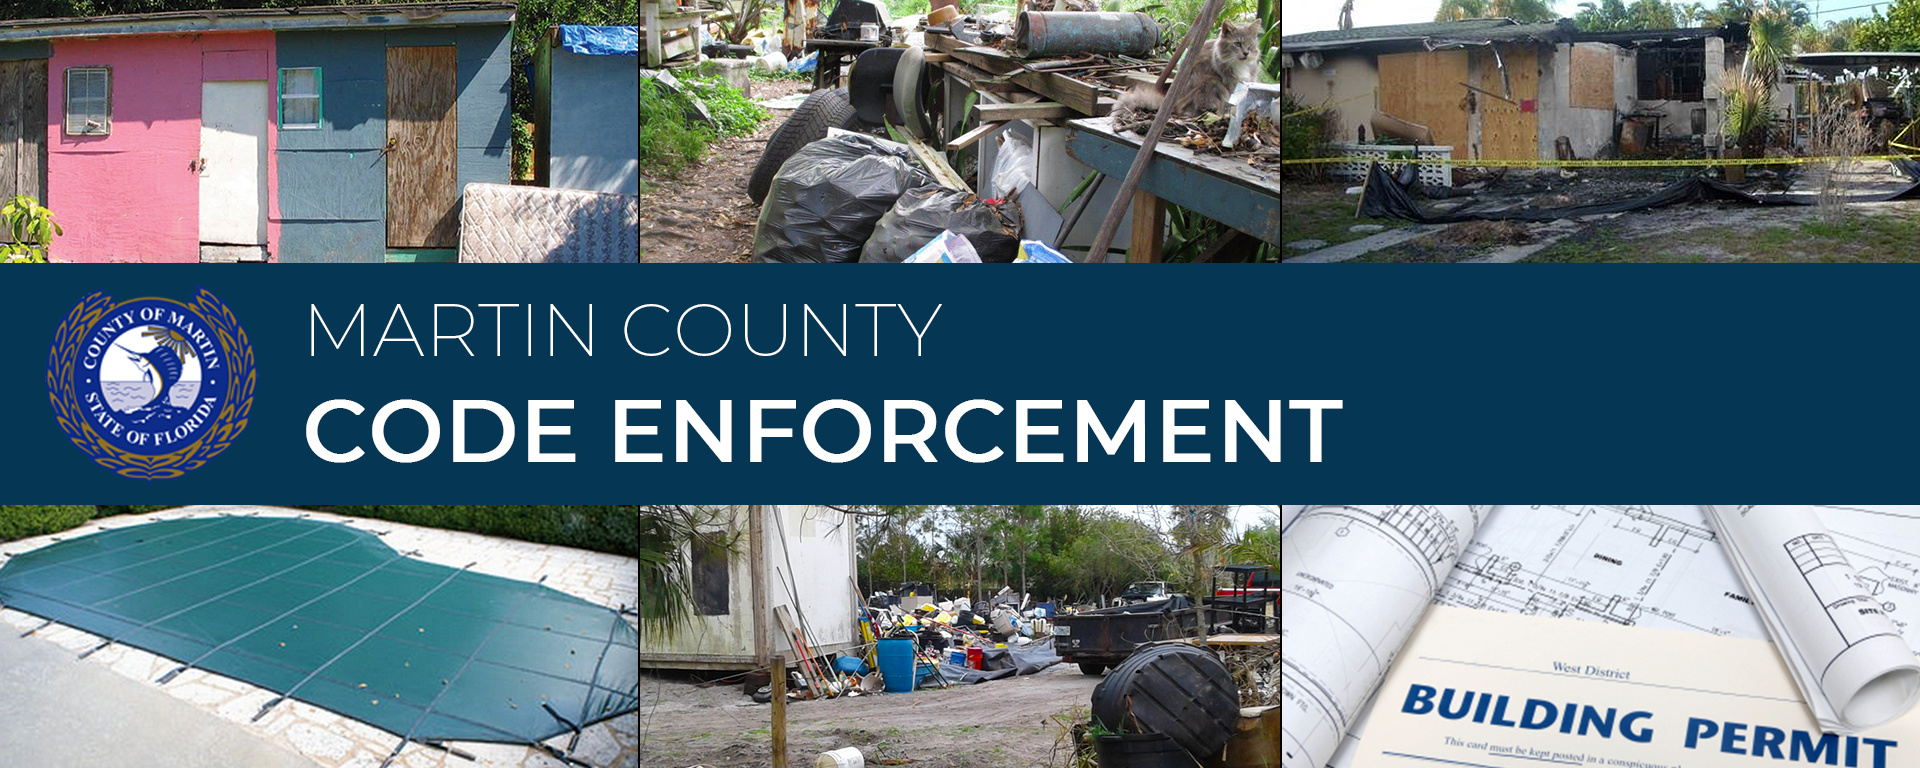 Martin County Code Enforcement